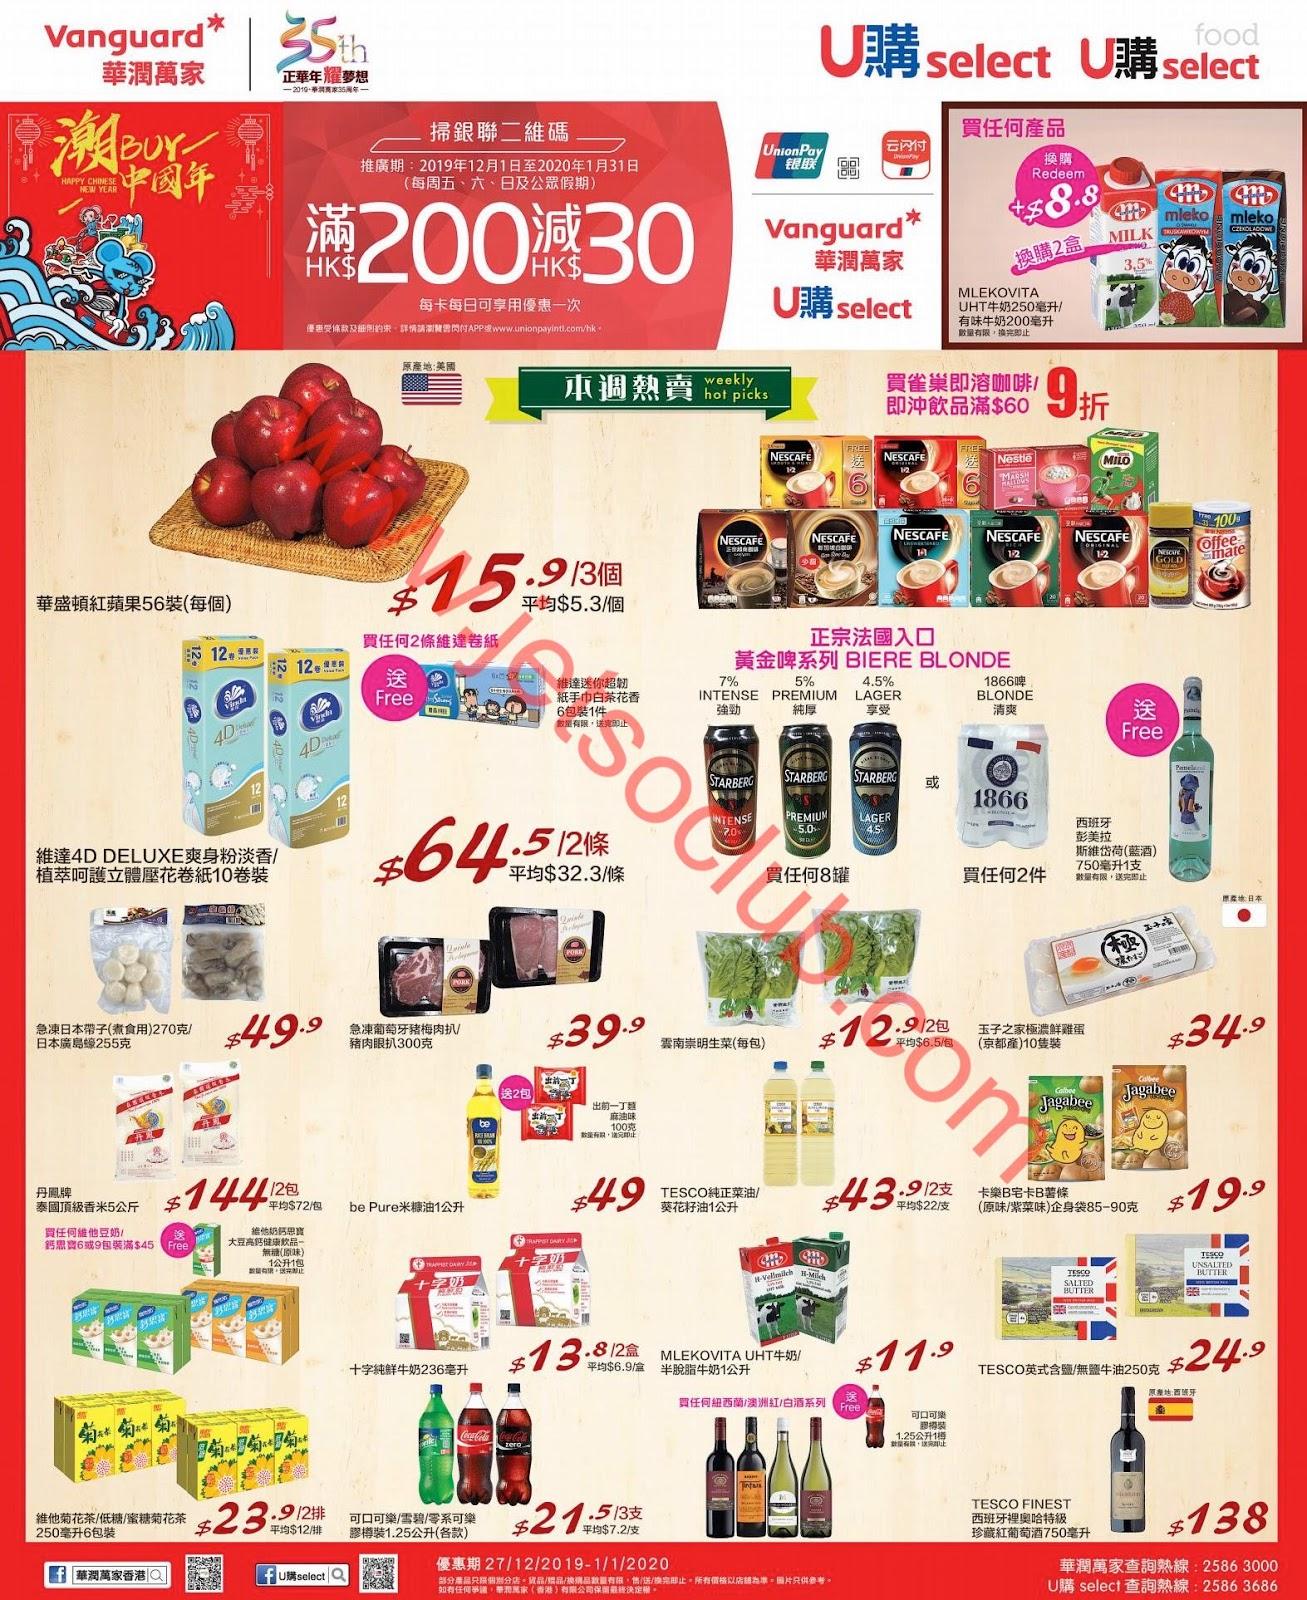 U購 select / 華潤萬家超級市場最新優惠(27/12) ( Jetso Club 著數俱樂部 )